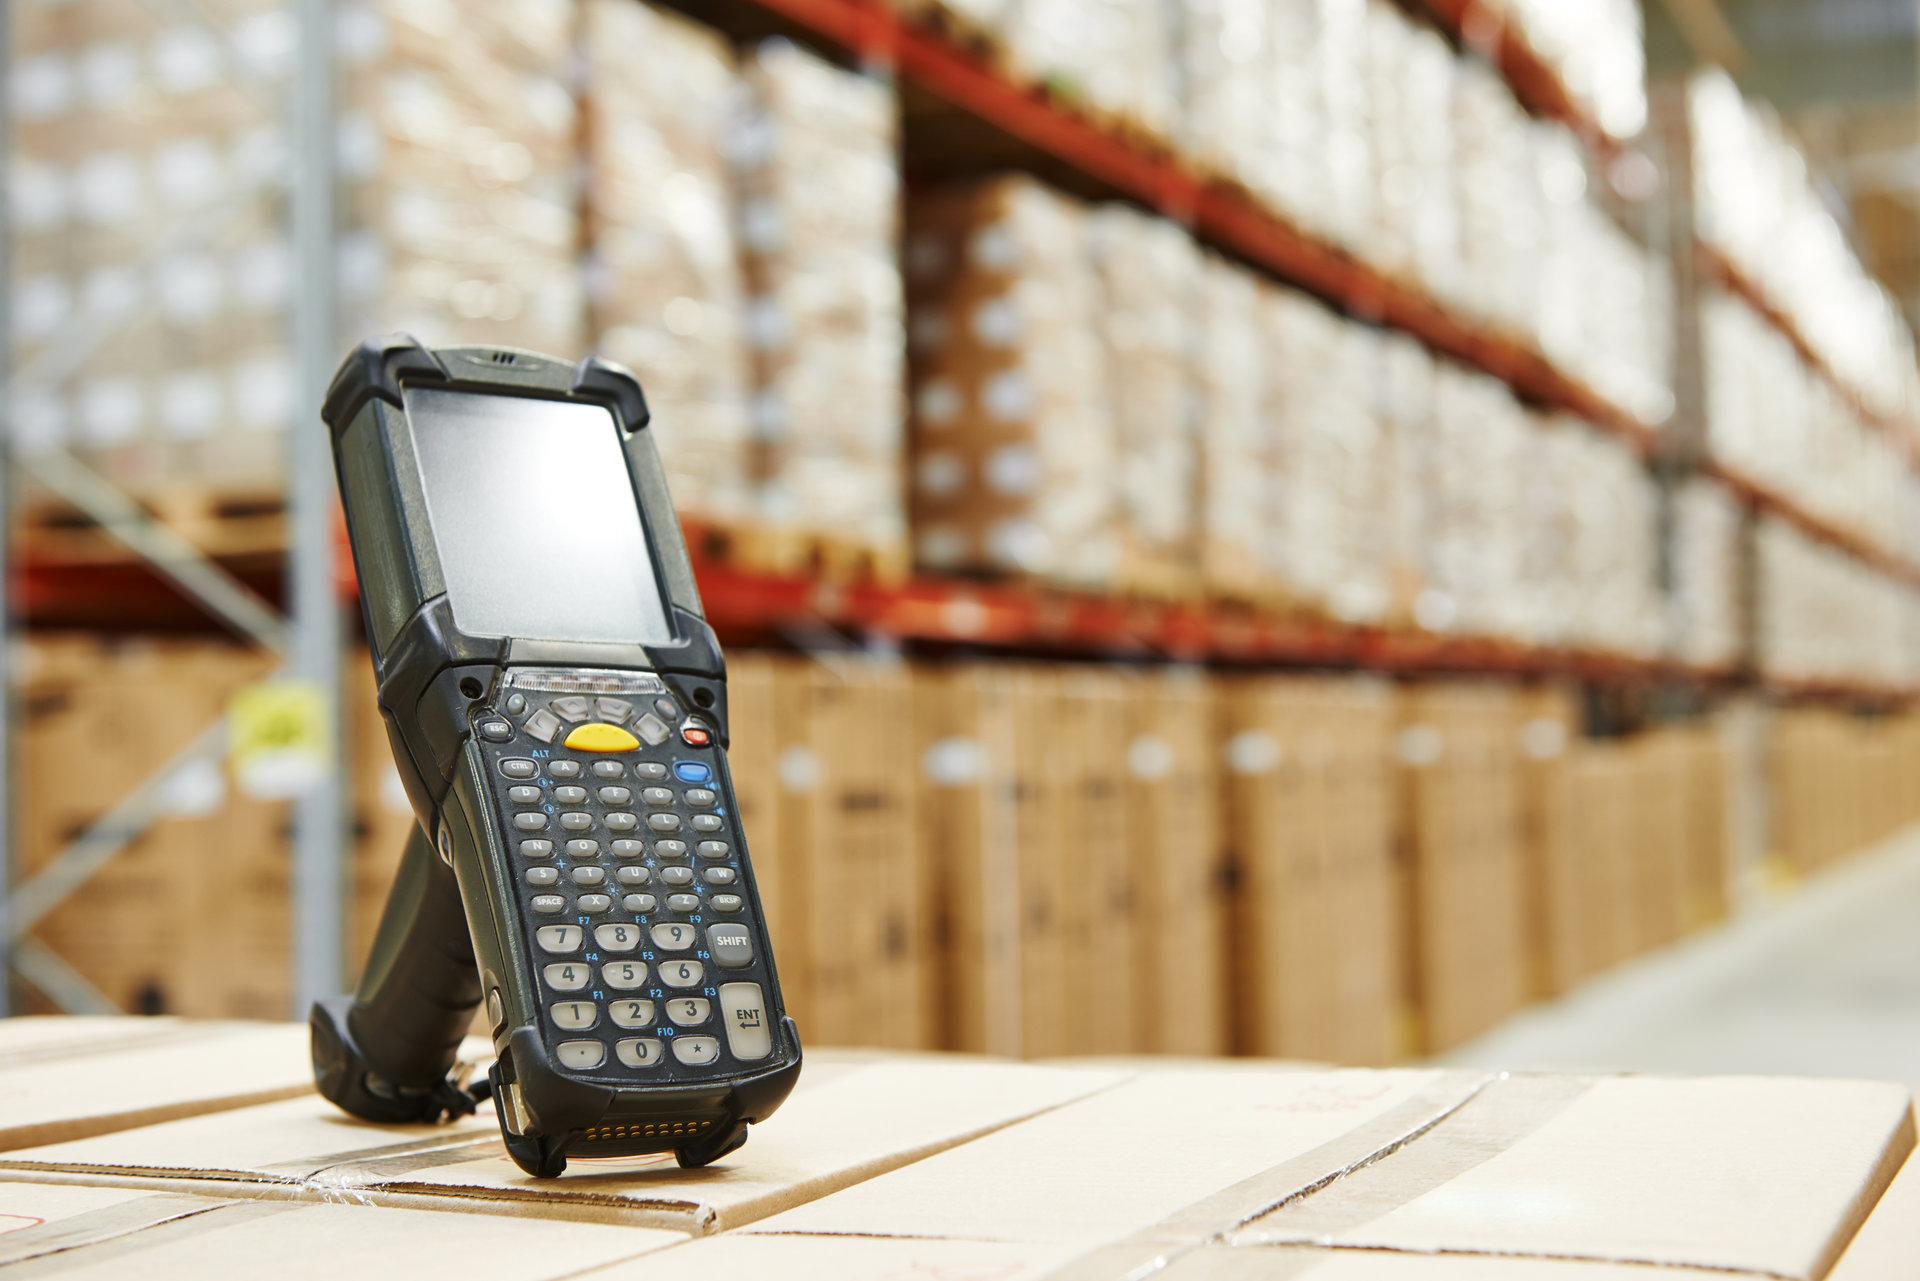 barcode-scanner-barcode-repair-refurbished-barcode-scanners